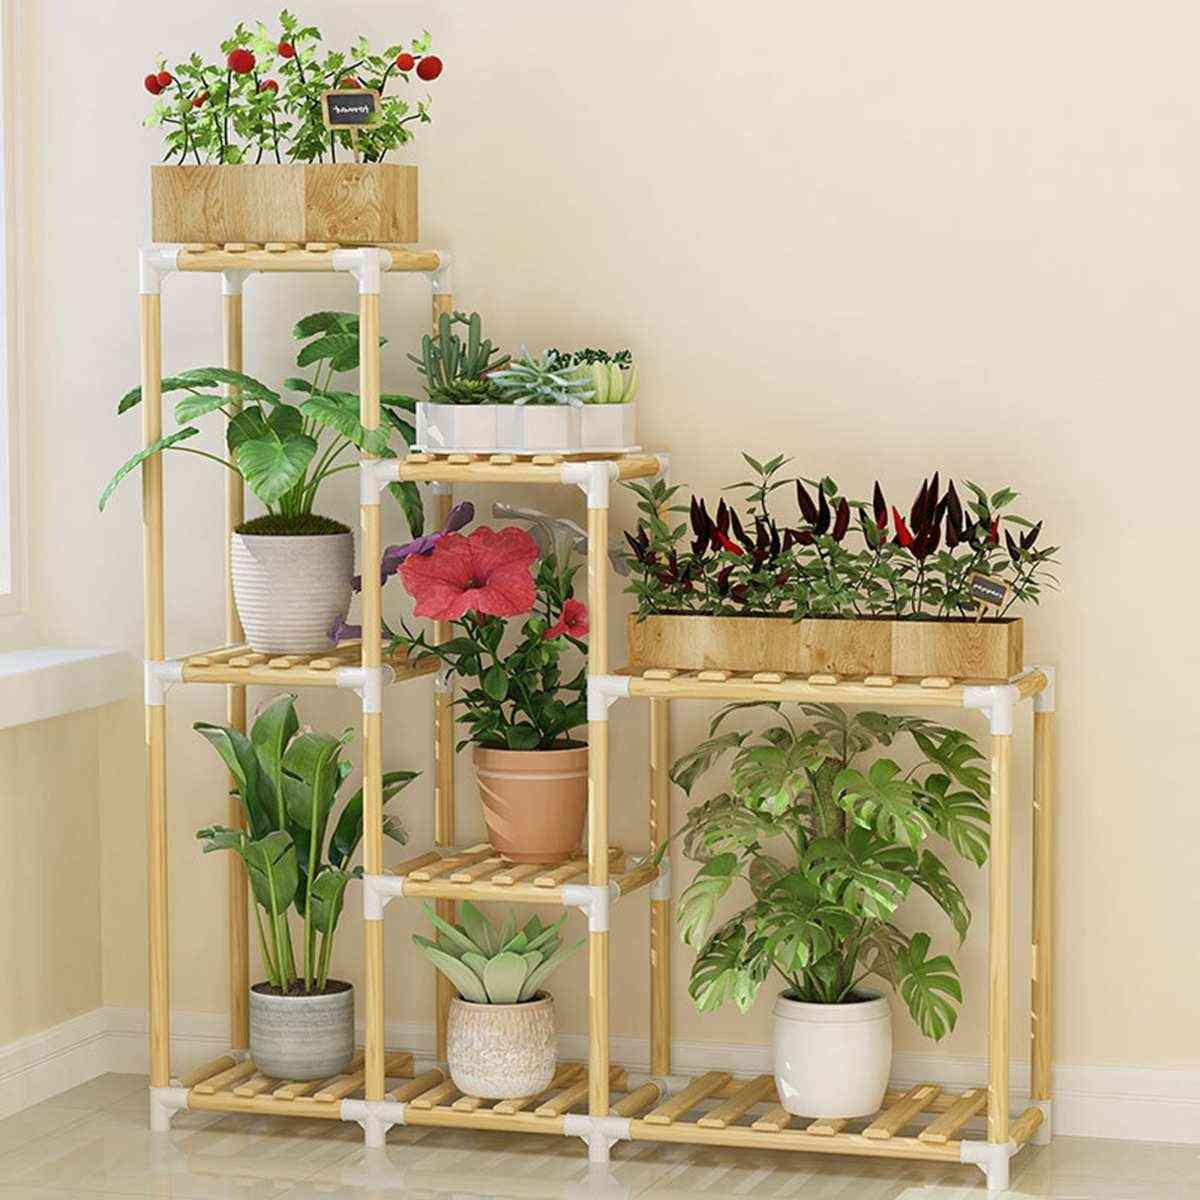 Wooden Flower Rack, Plant Stand Multi-layer Shelves